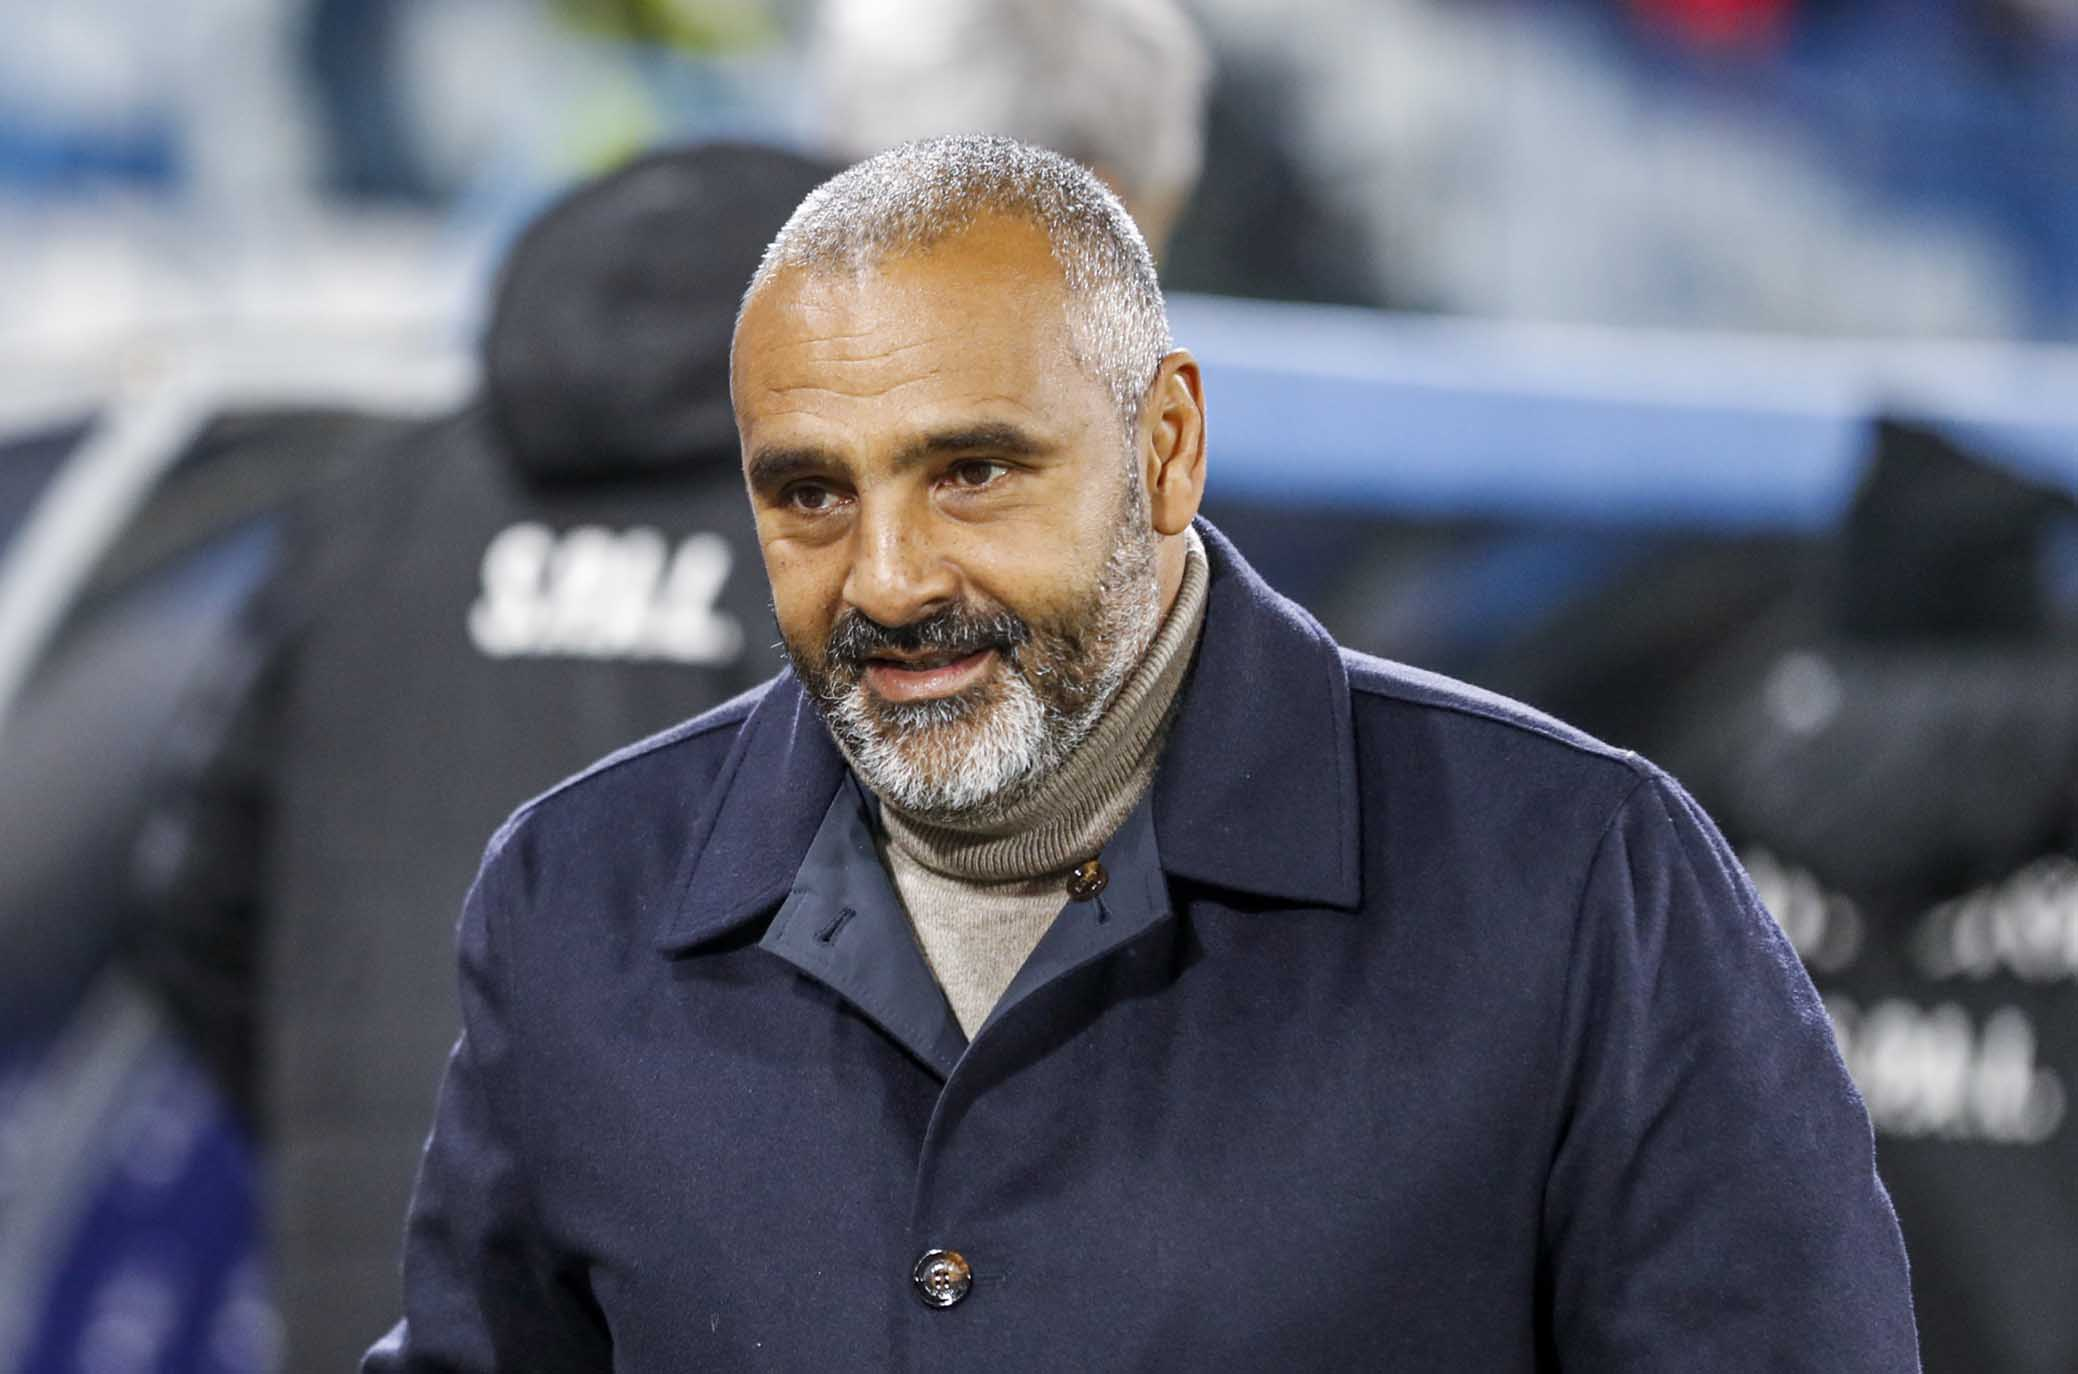 Lecce-Genoa da 0-2 a 2-2: eurogol di Pandev e rossoblù in nove